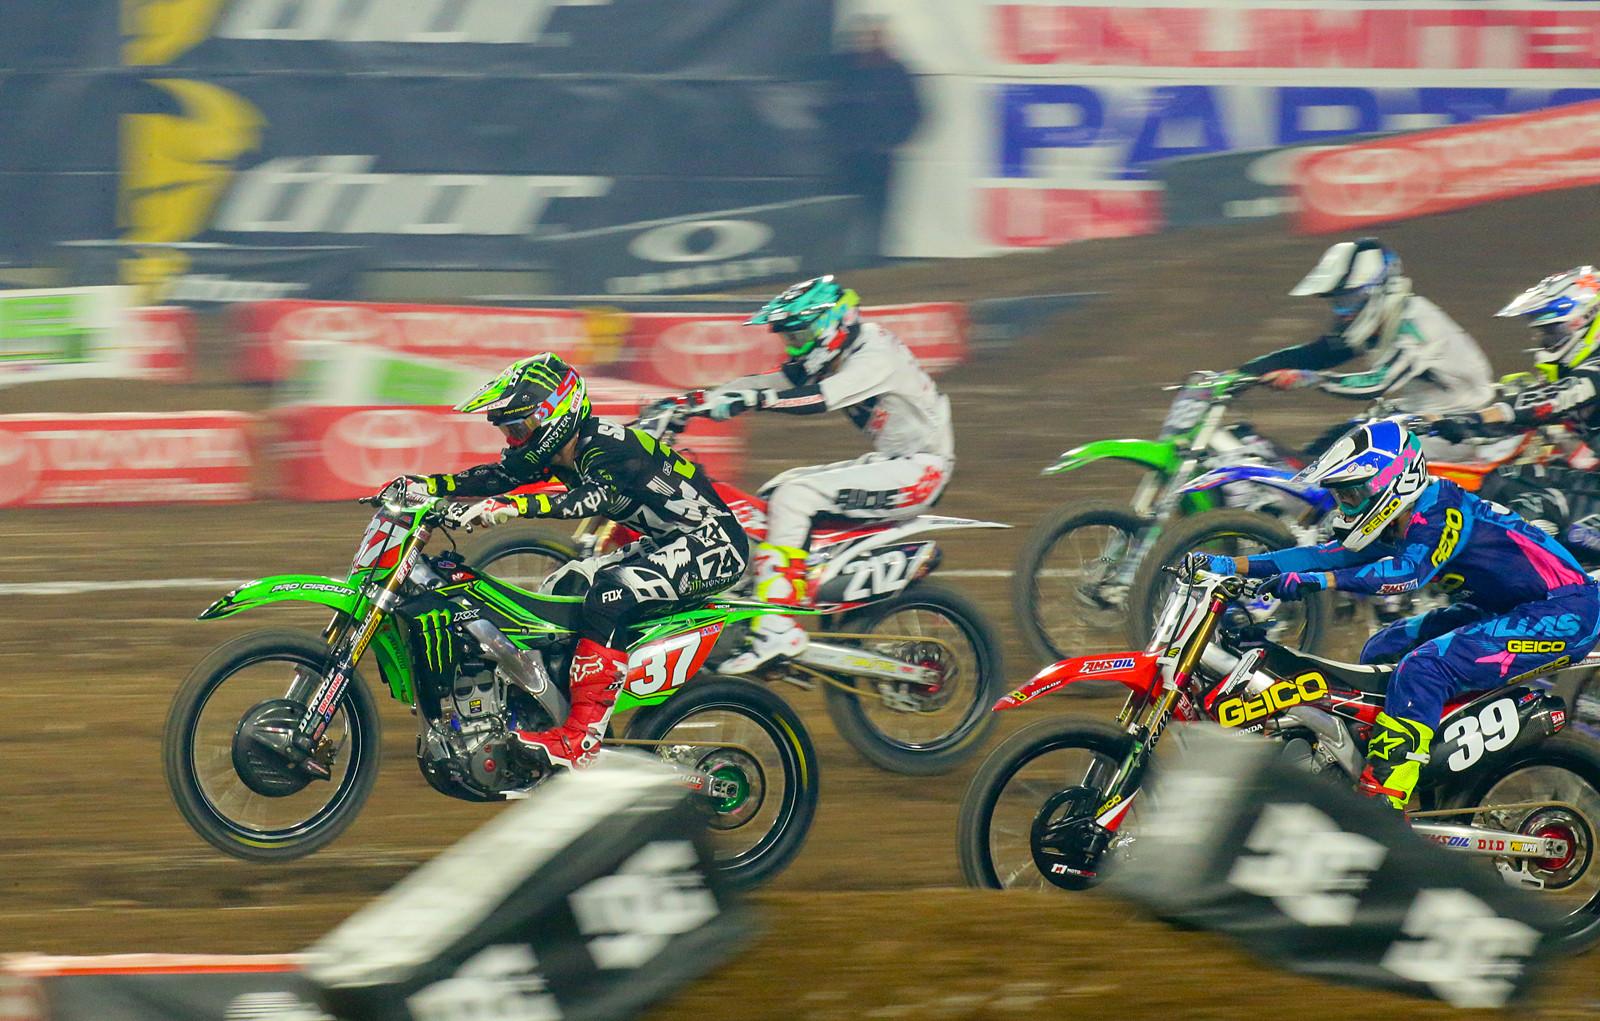 250 Heat Race One Start - Photo Blast: Glendale - Motocross Pictures - Vital MX